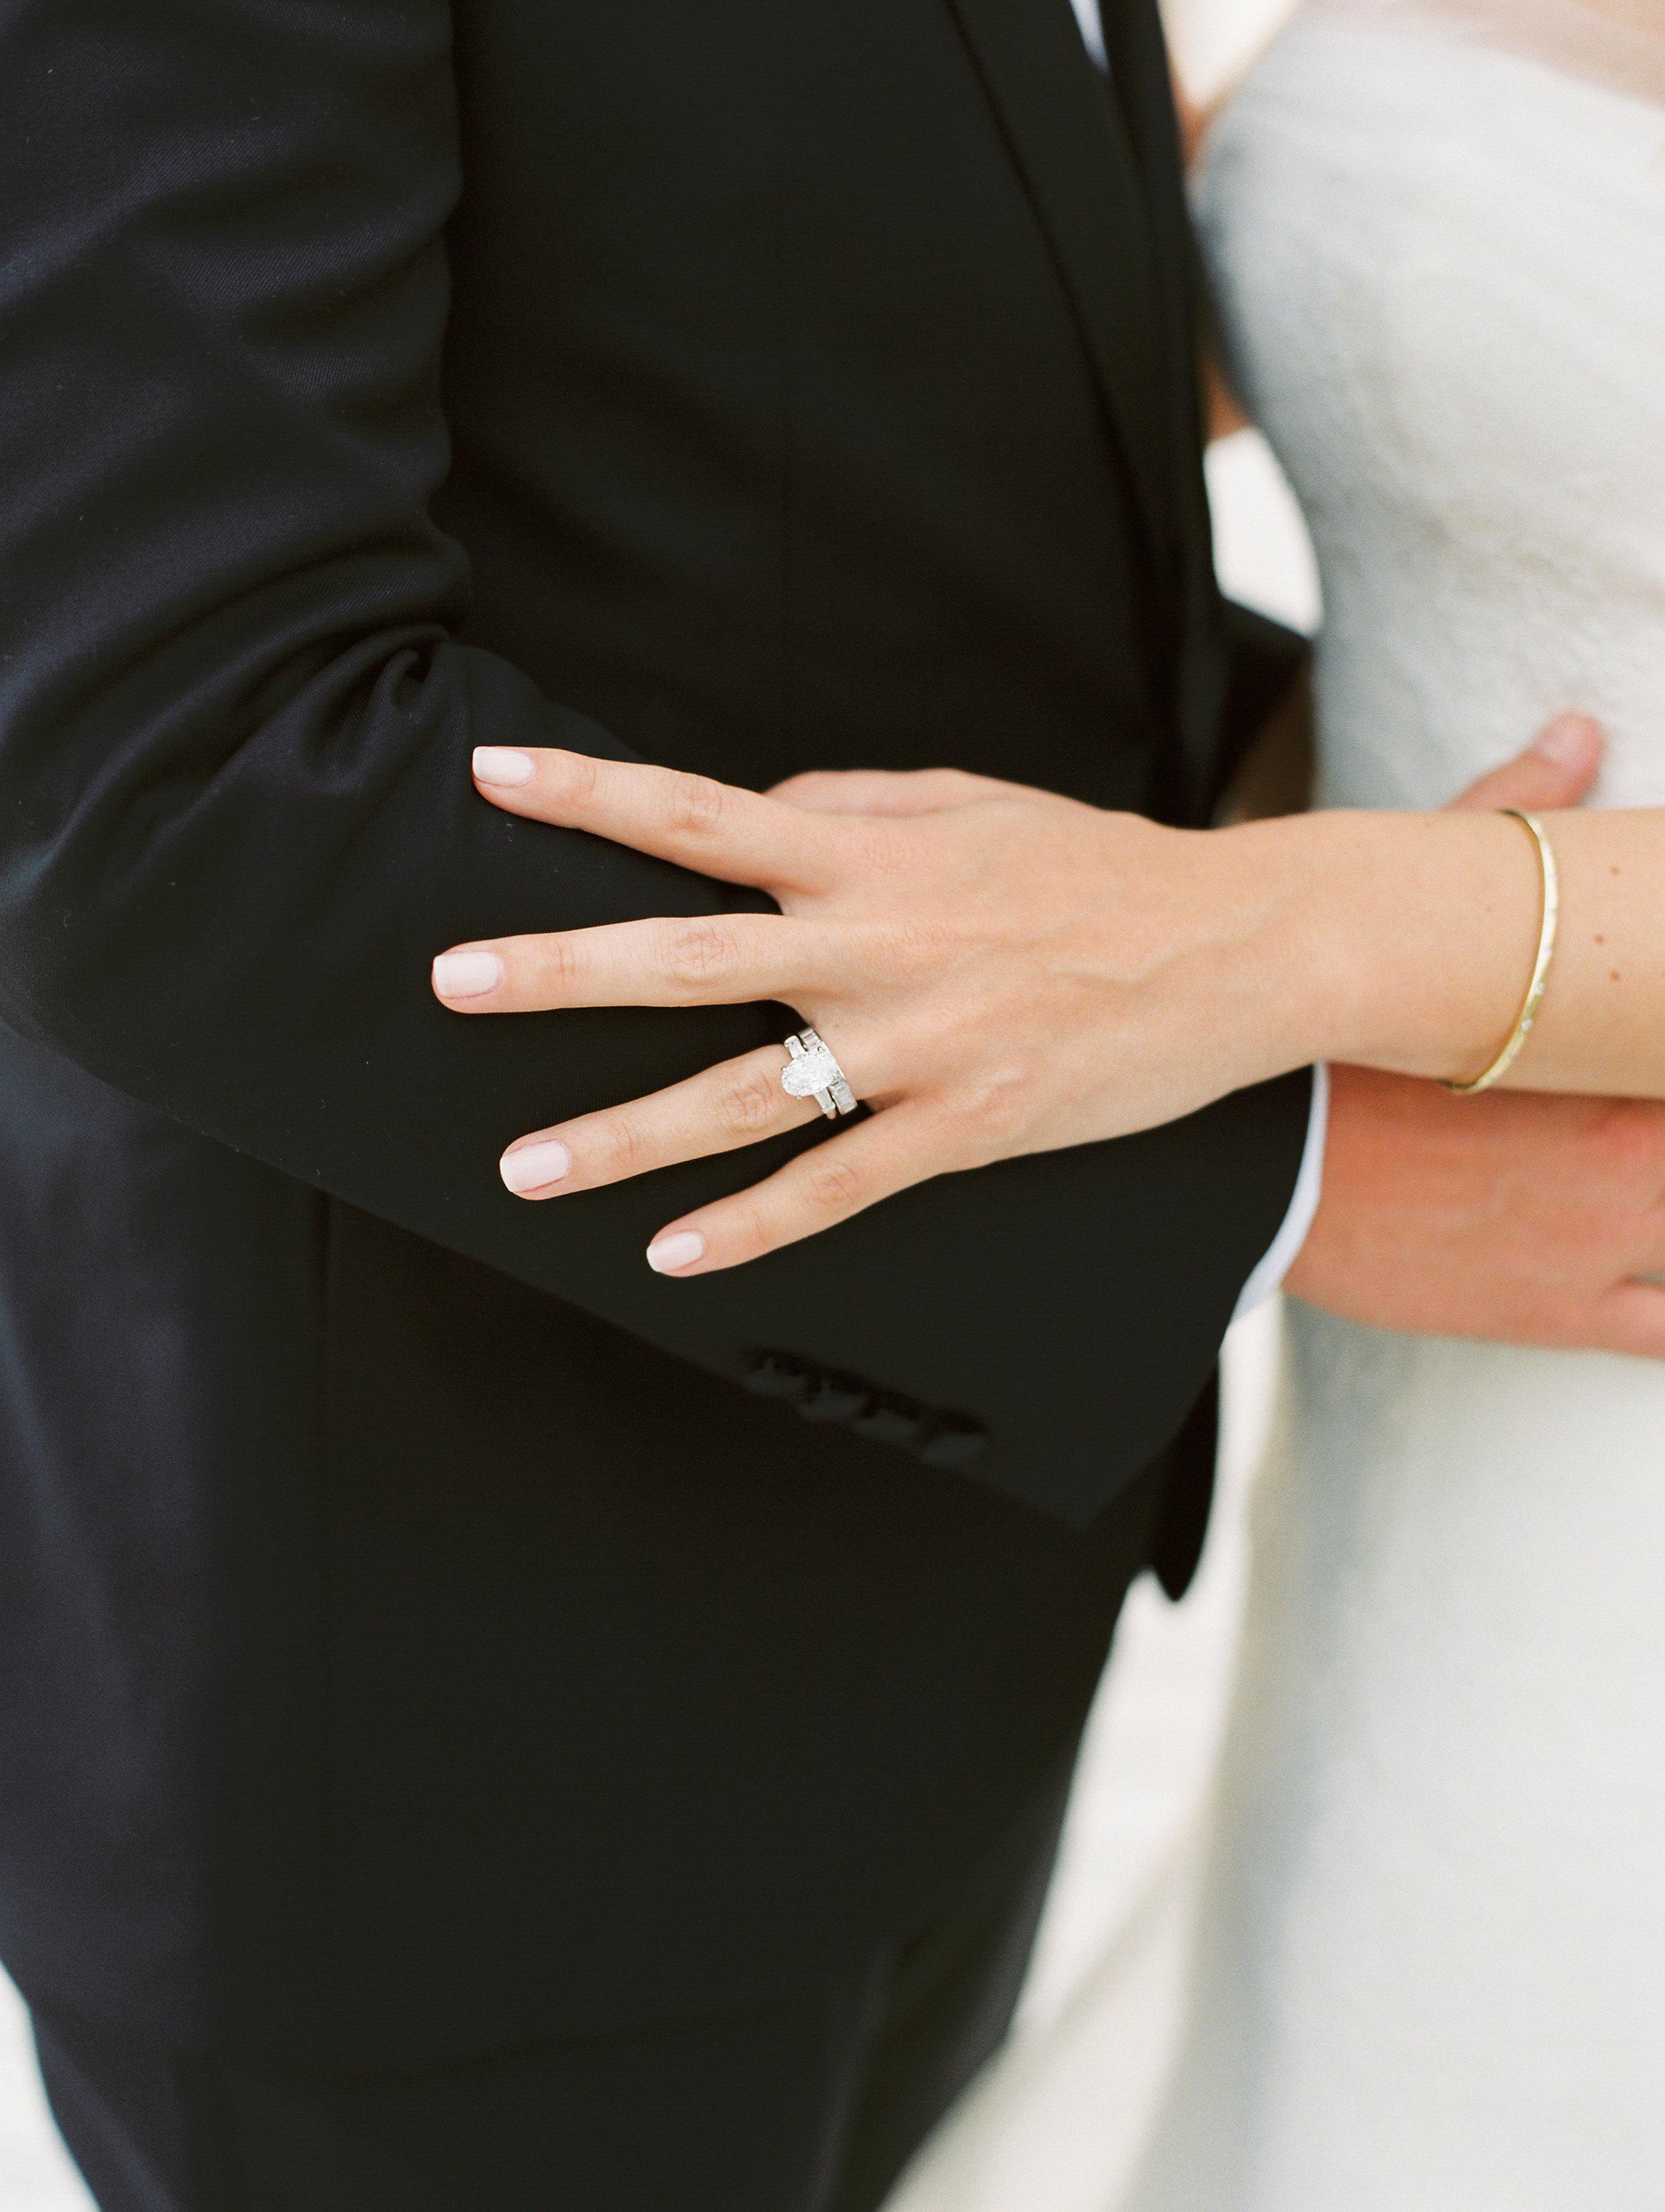 Coffman+Wedding+Bride+Groom+Sunset-46.jpg